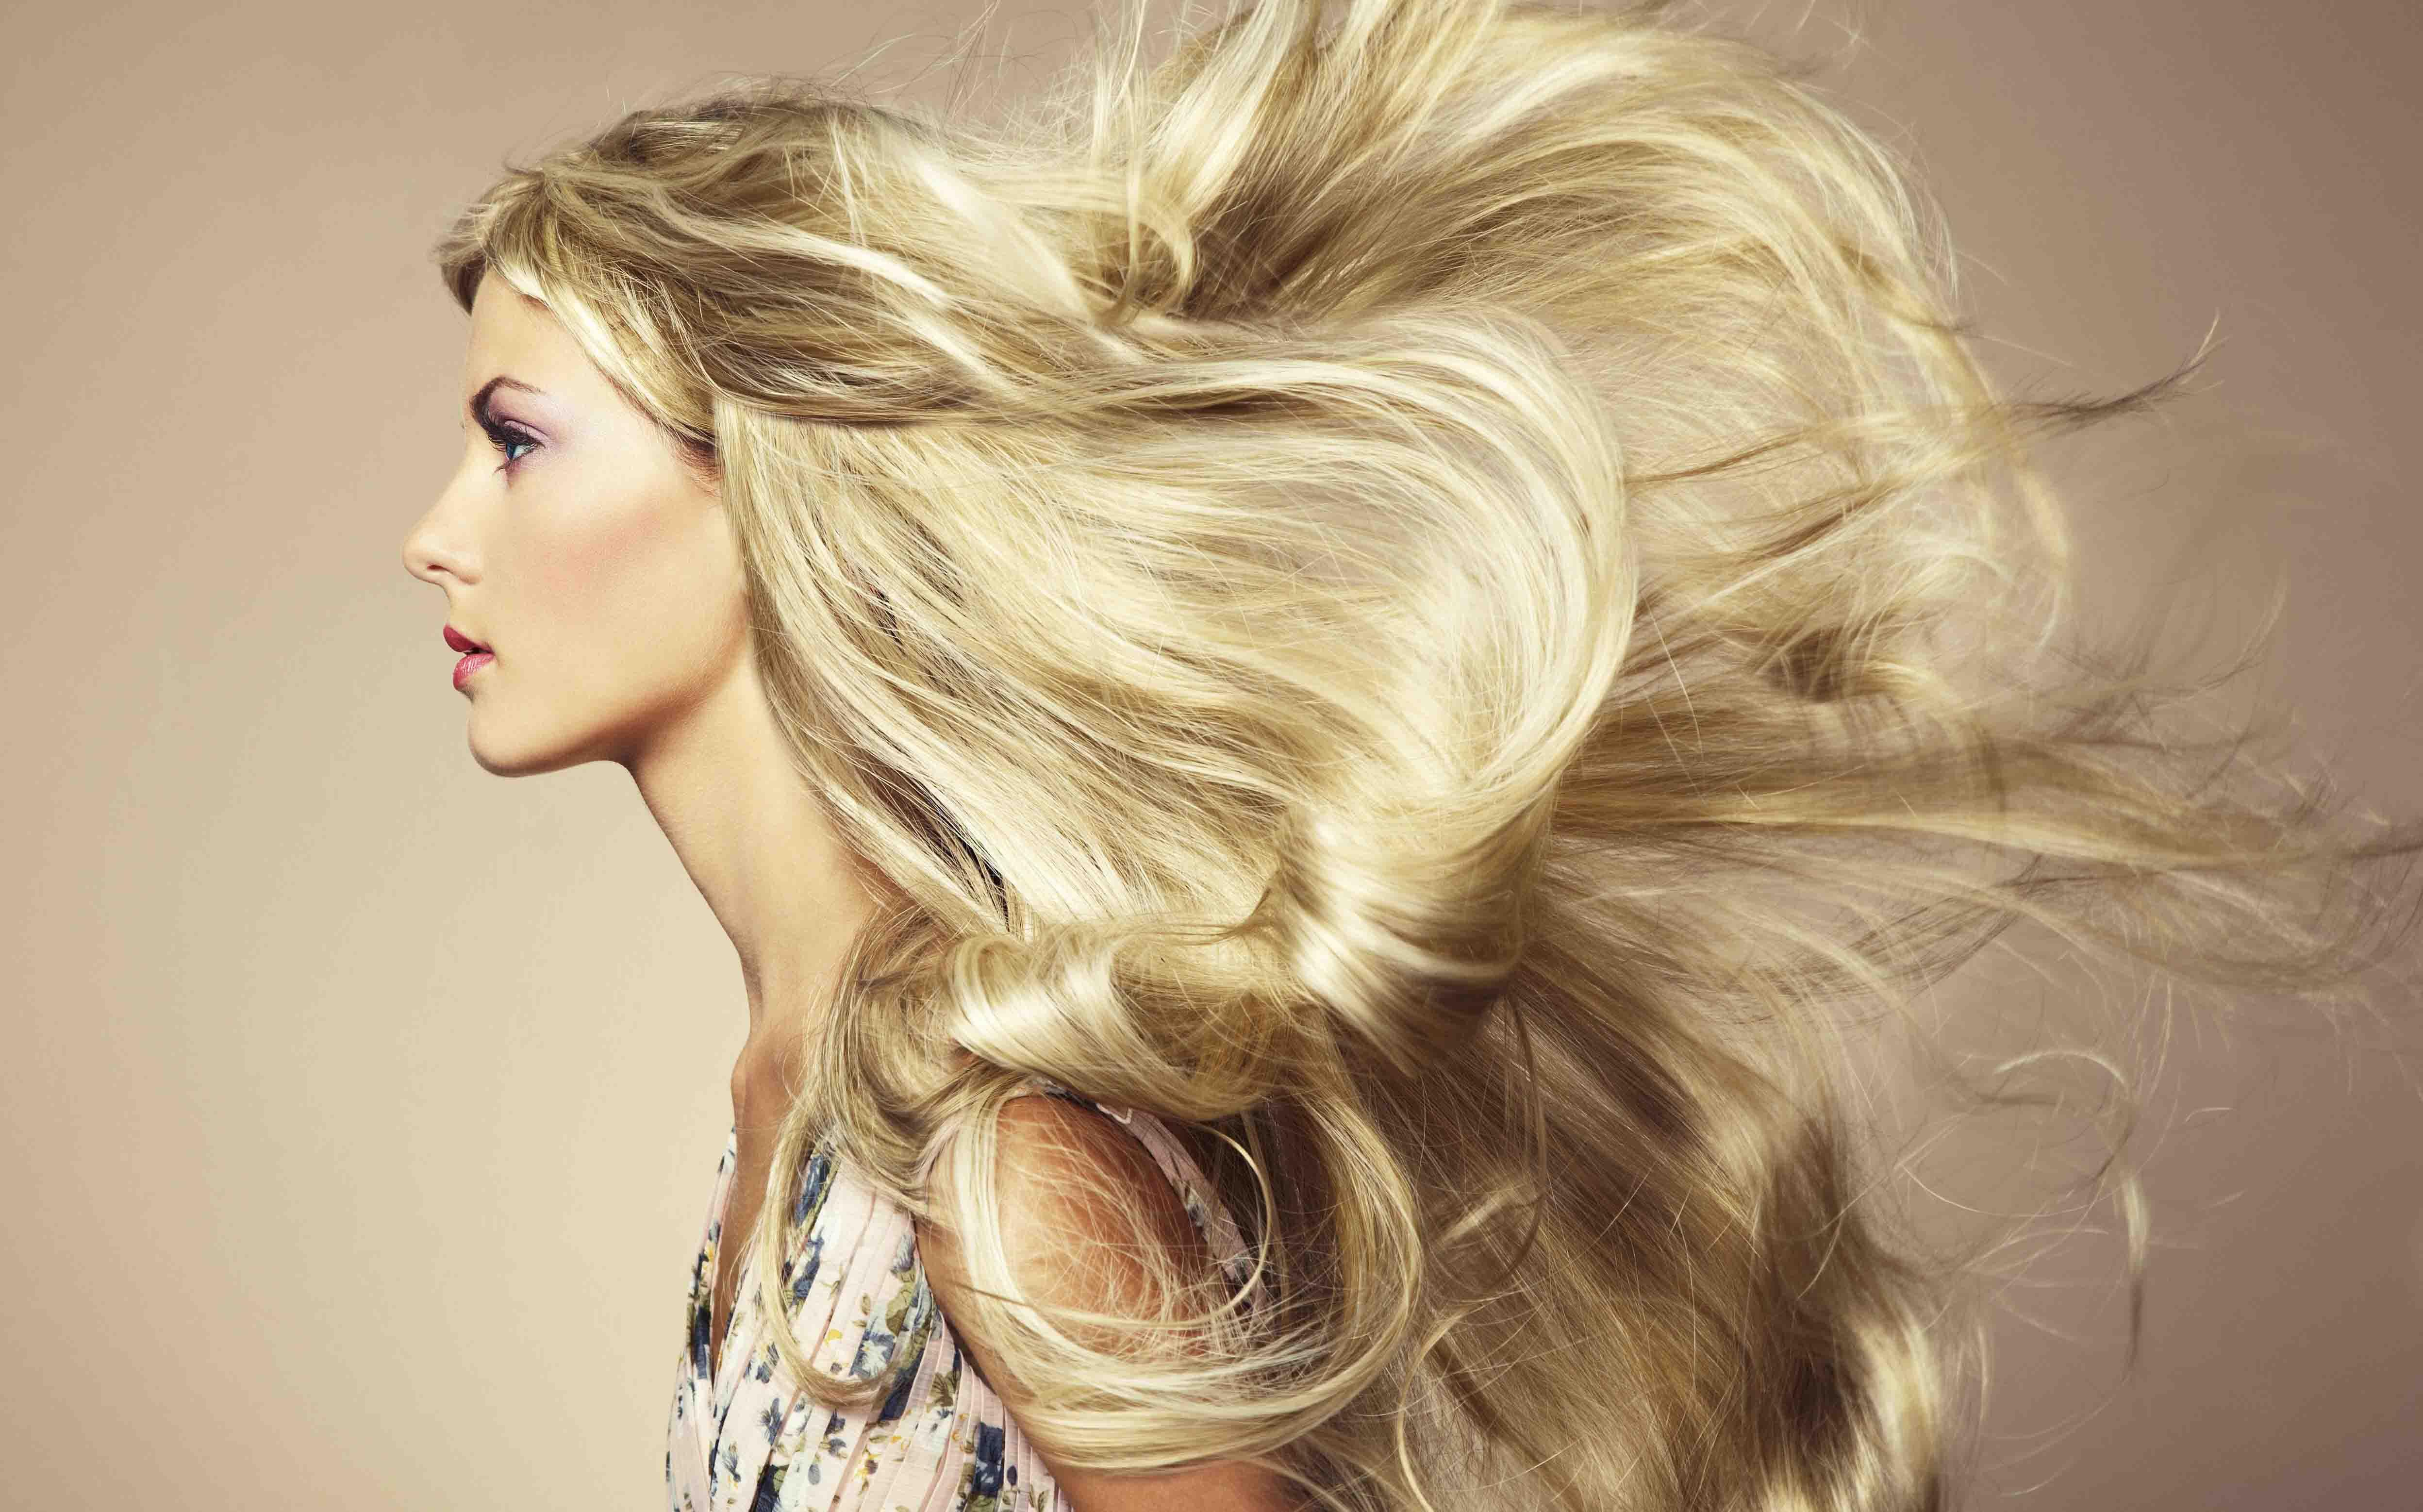 capelli-biondi-zephir-parrucchieri-ascona-muralto